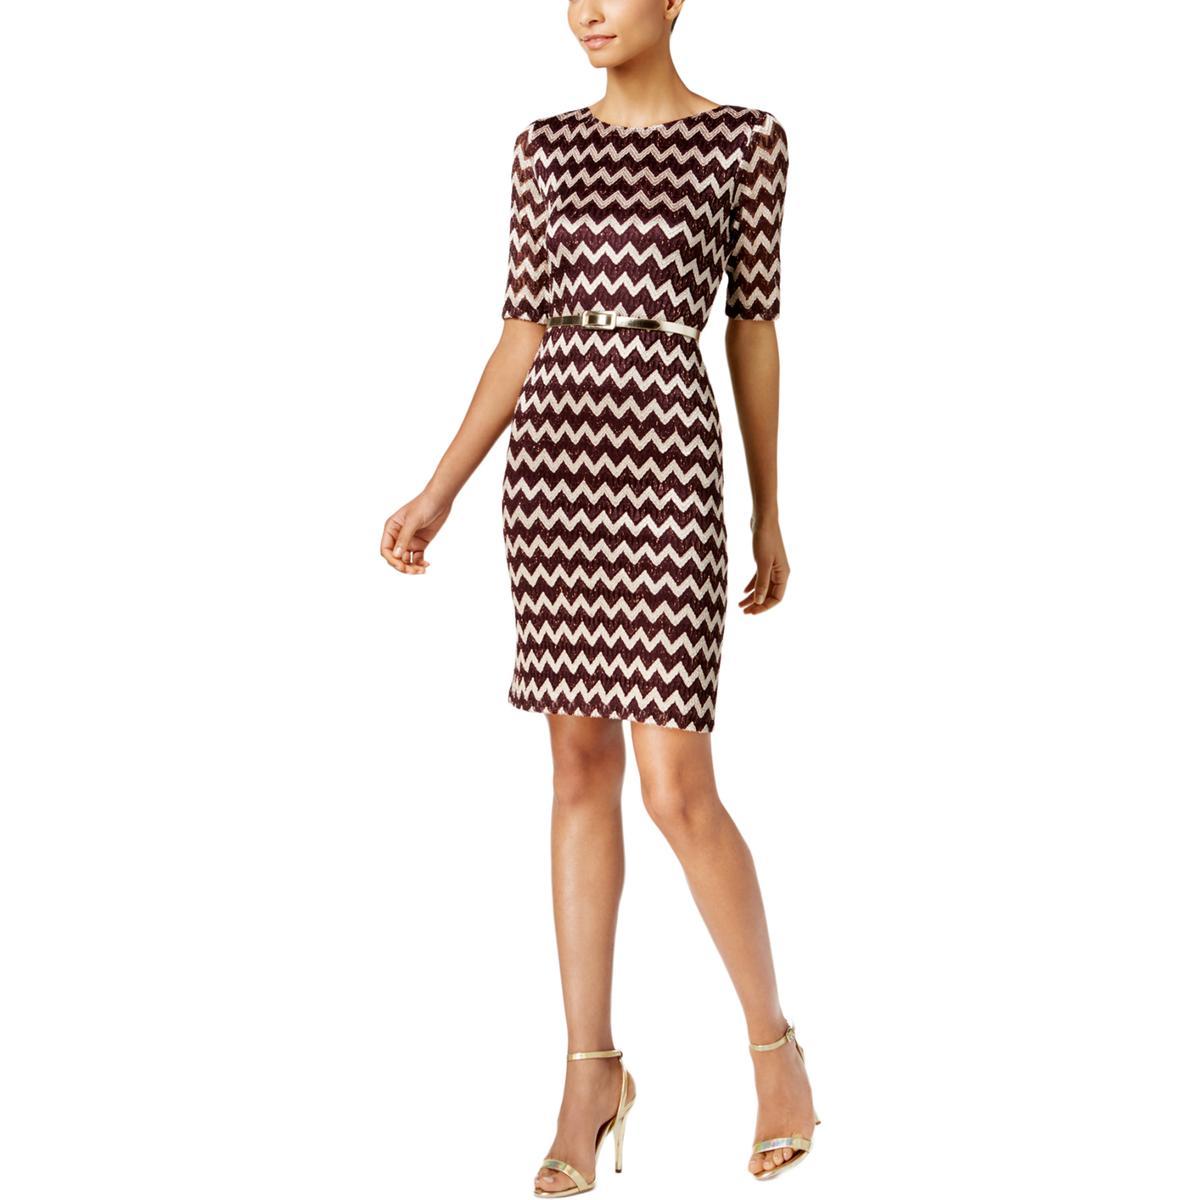 cdea4fe338228 Connected Apparel Womens Purple Lace Metallic Semi-formal Dress 14 ...